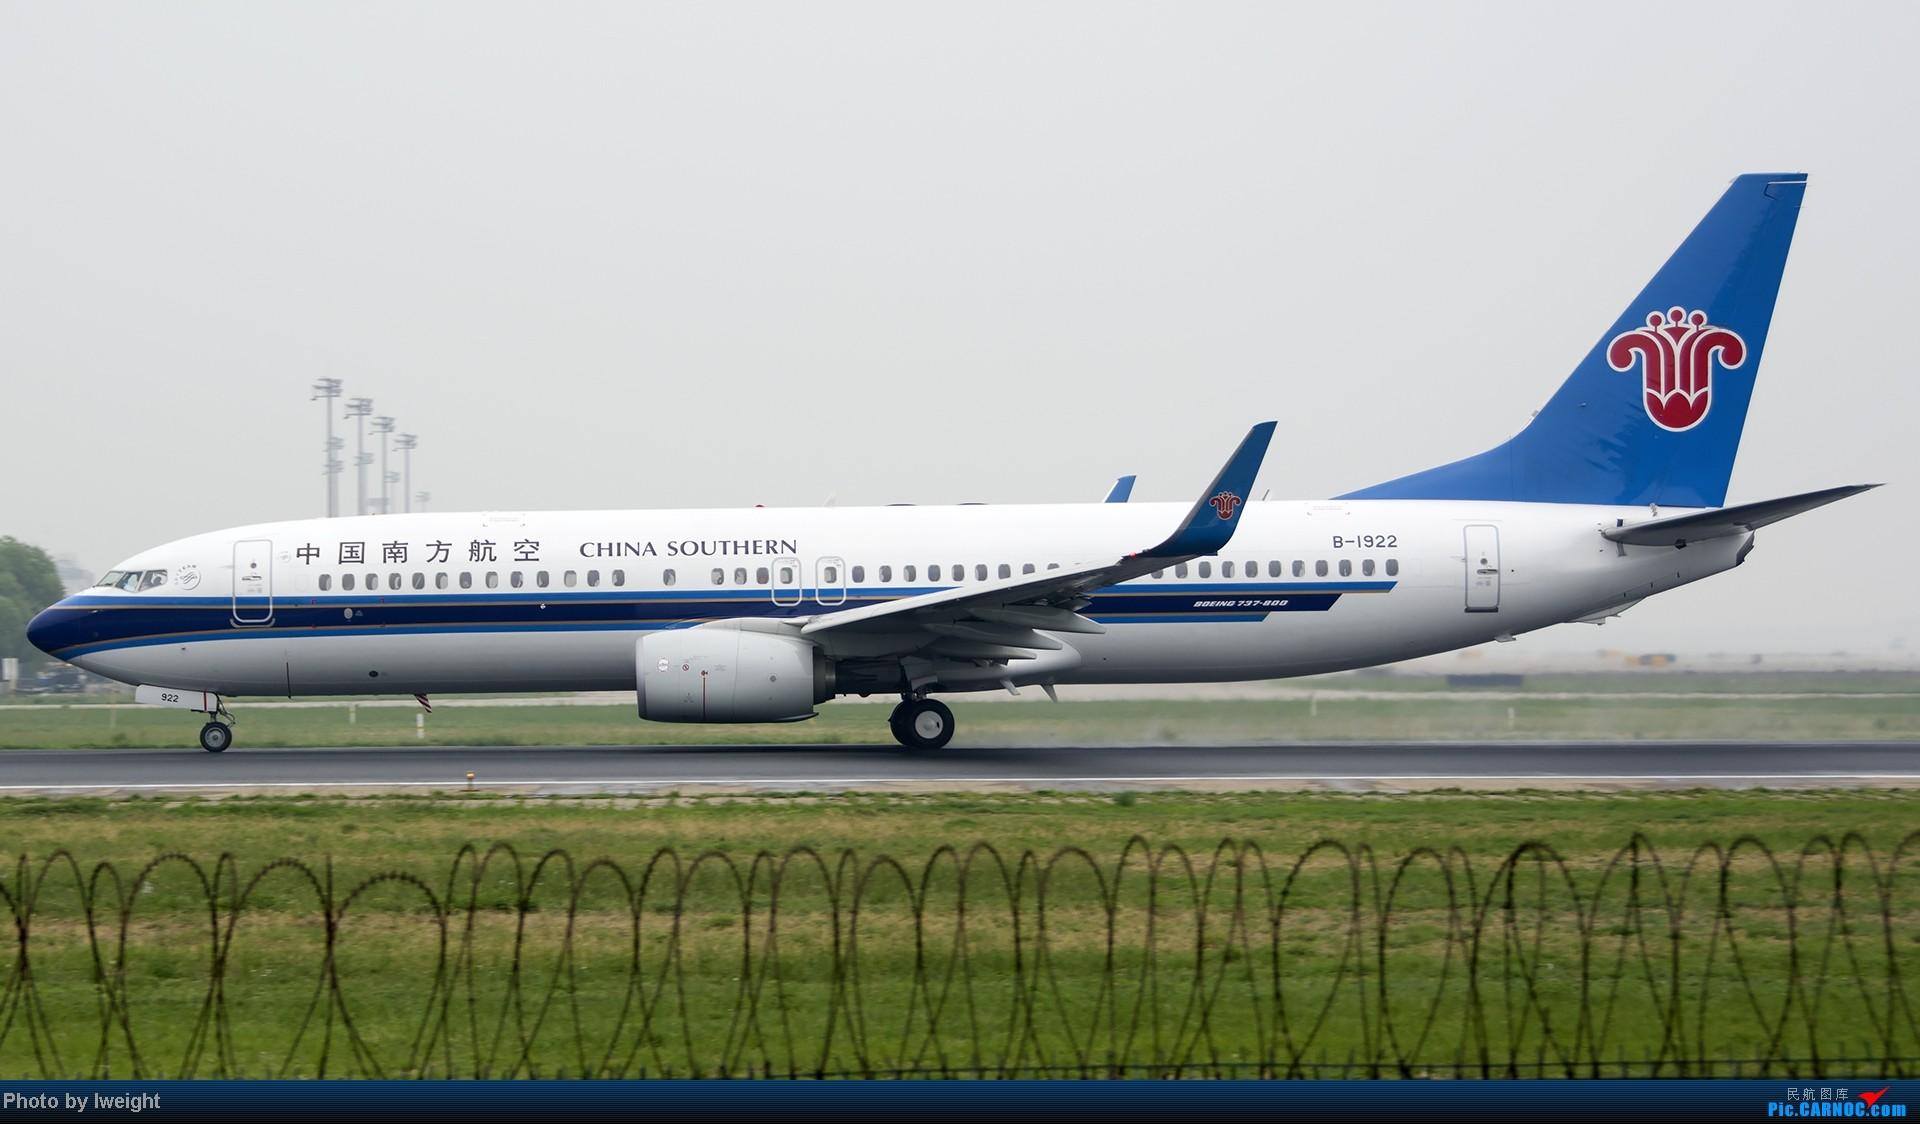 Re:[原创]休假无聊,跑道边来拍机玩(晚点的ZestAir、换装的B6100和刚交付的B2738等) BOEING 737-800 B-1922 中国北京首都机场